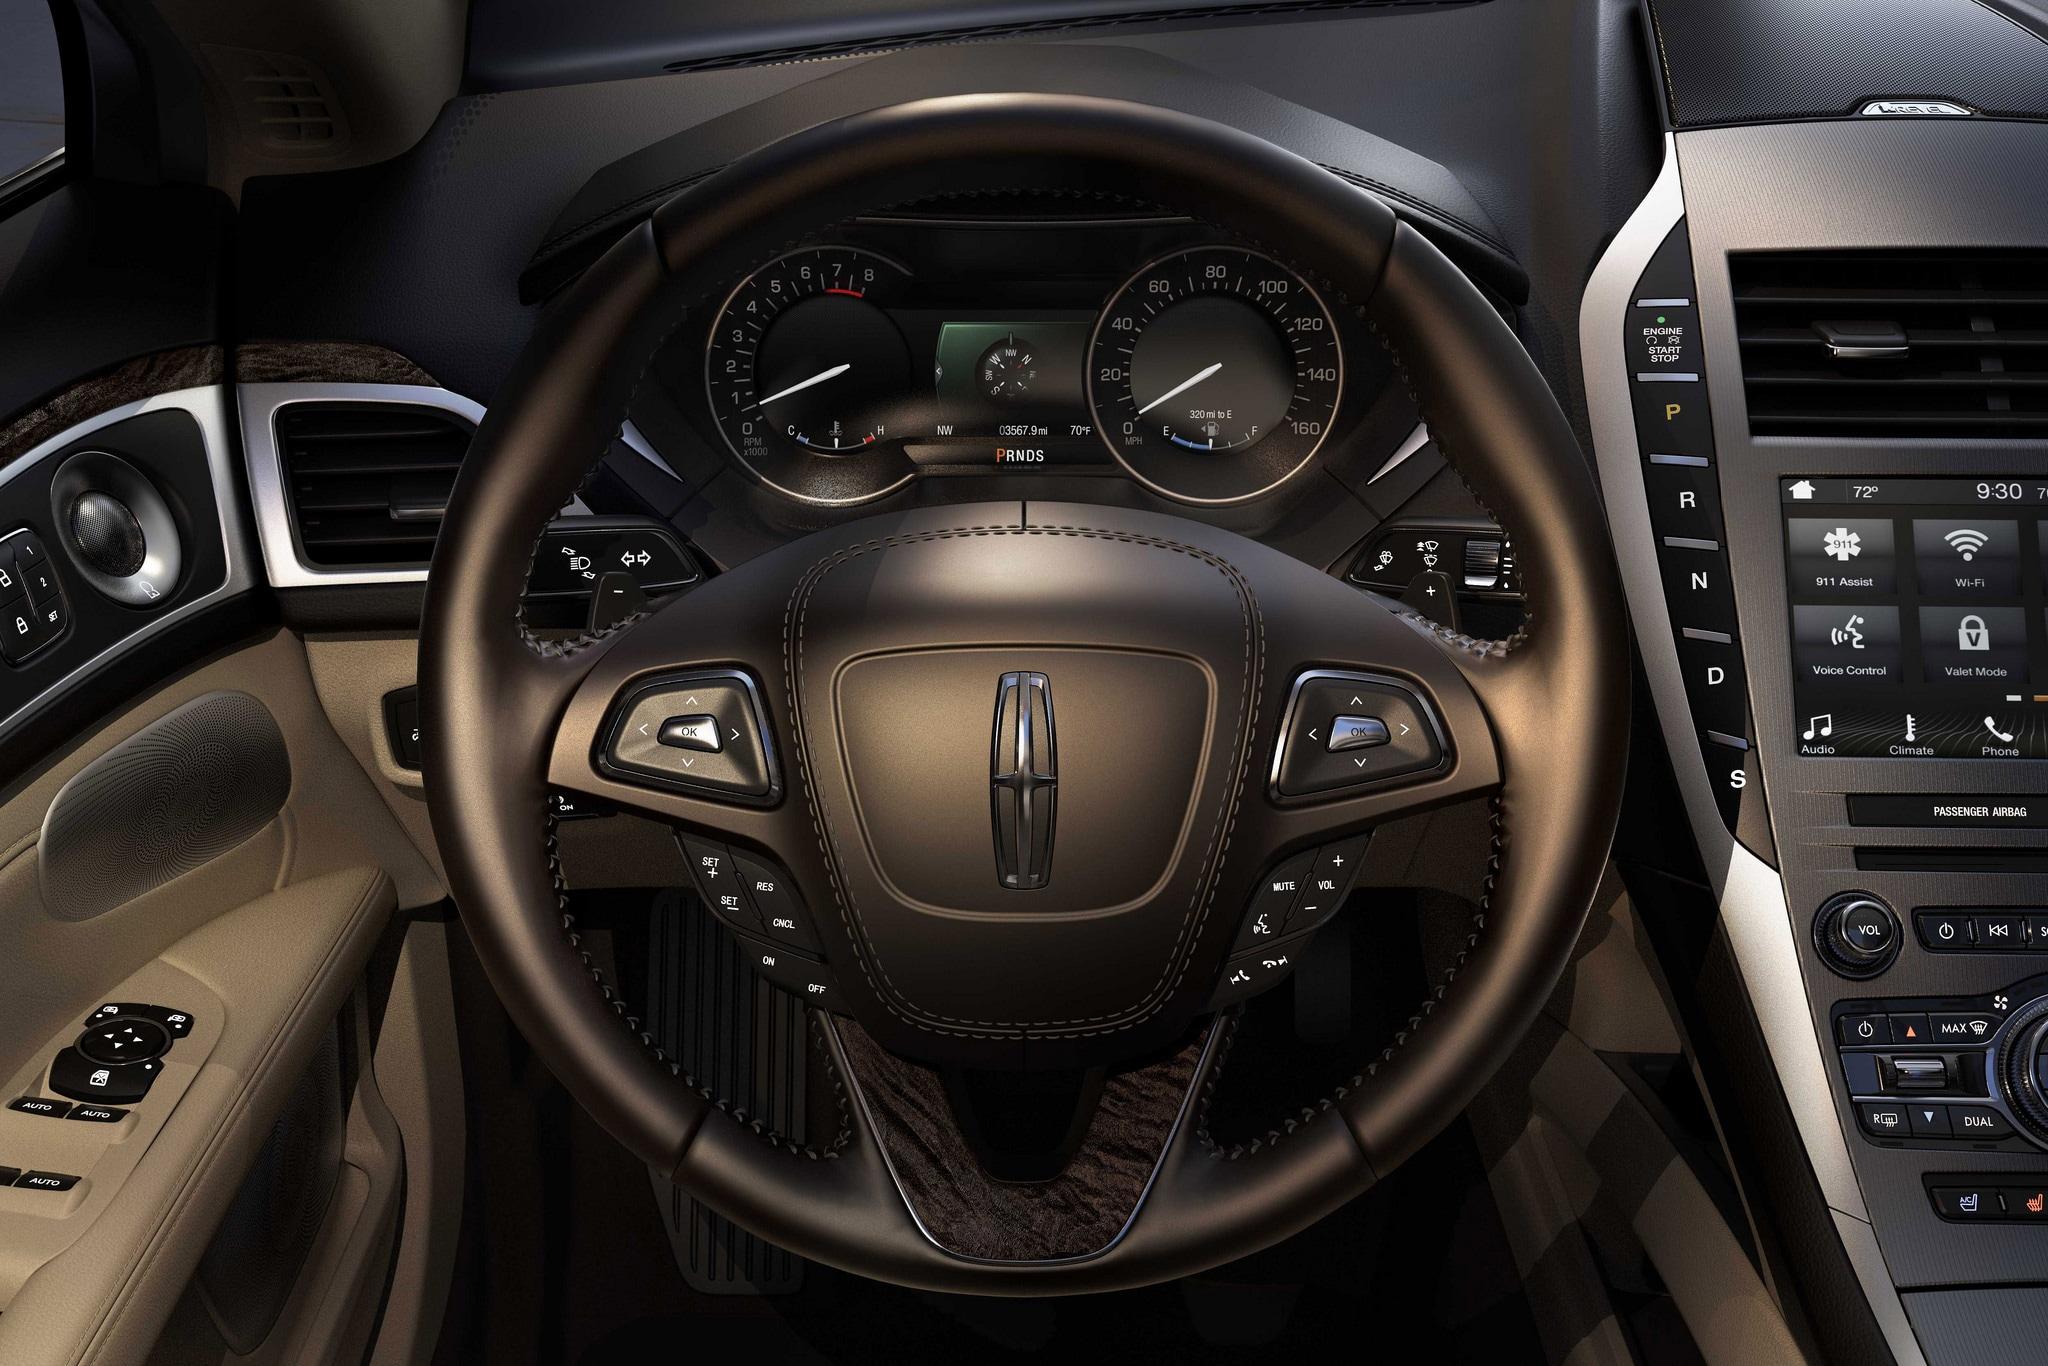 2017 Lincoln MKZ Dashboard Indicator Lights